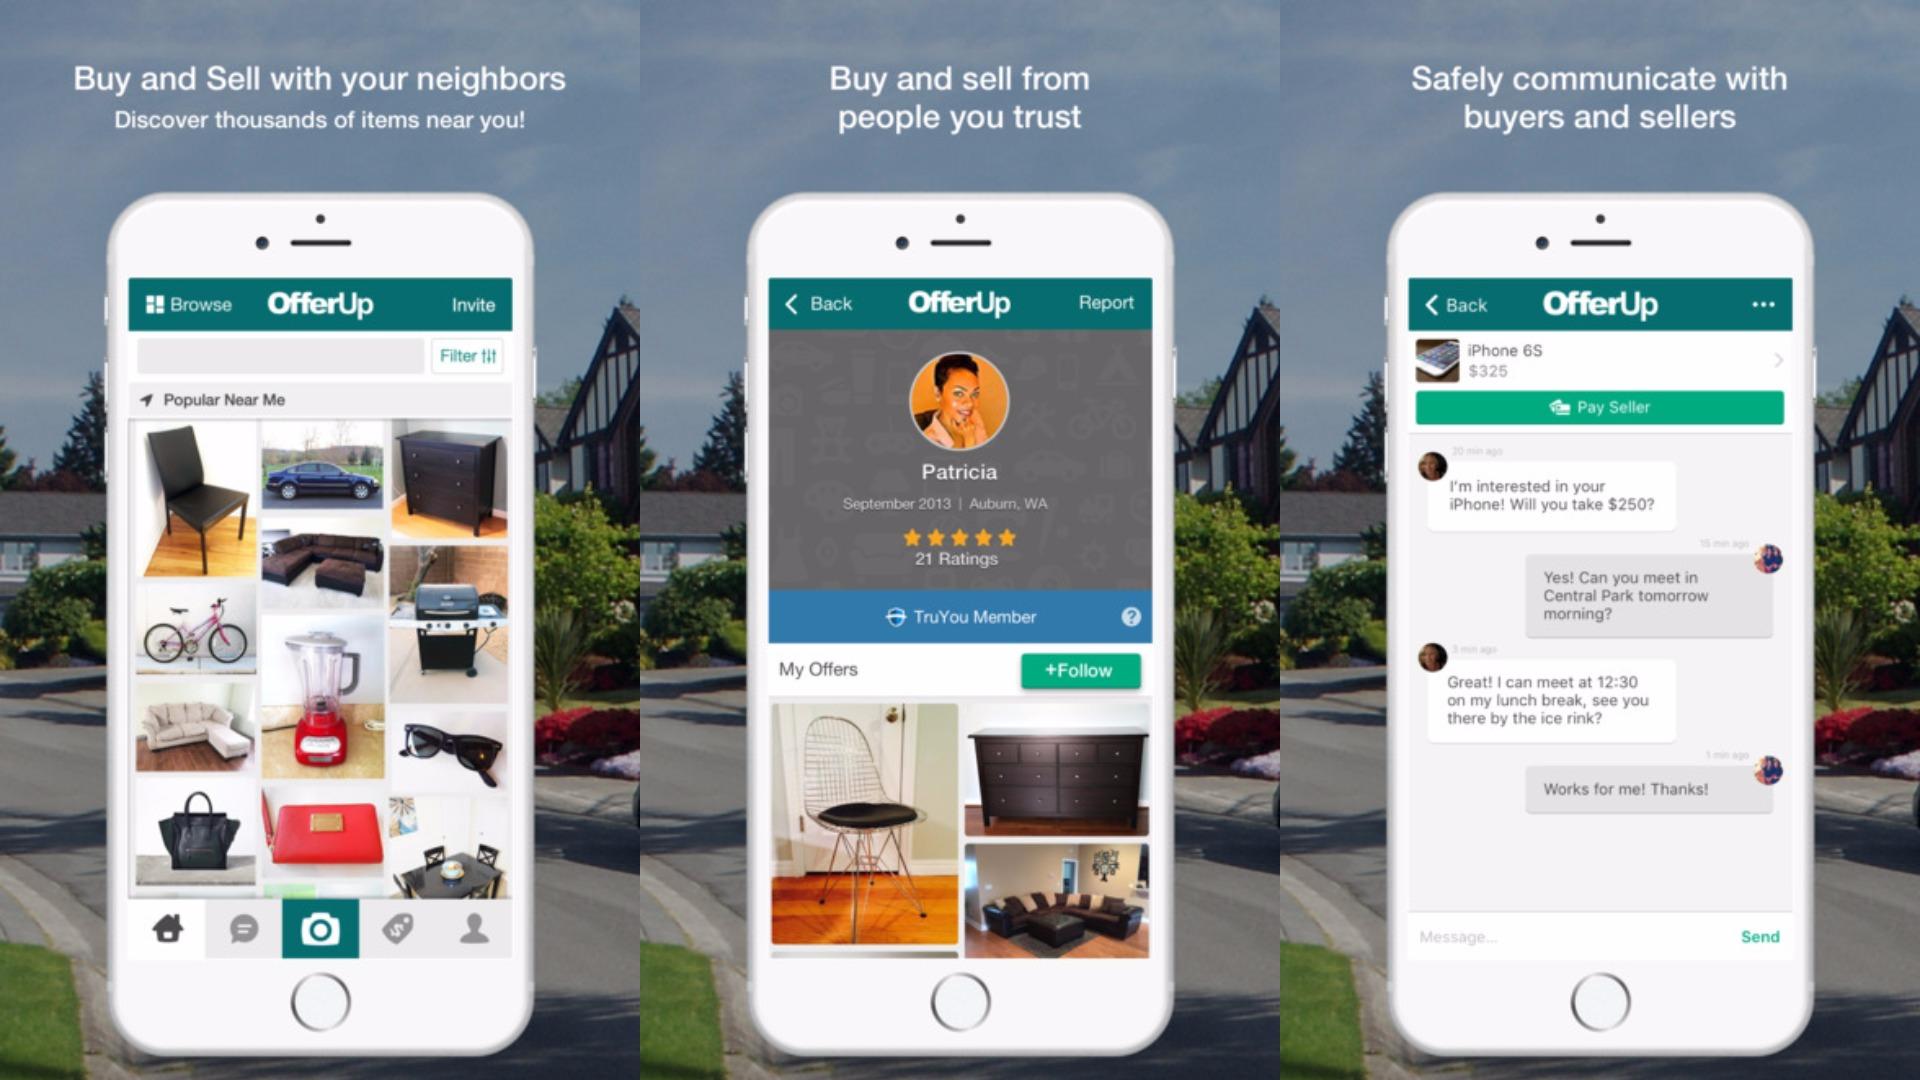 Display of app OfferUp